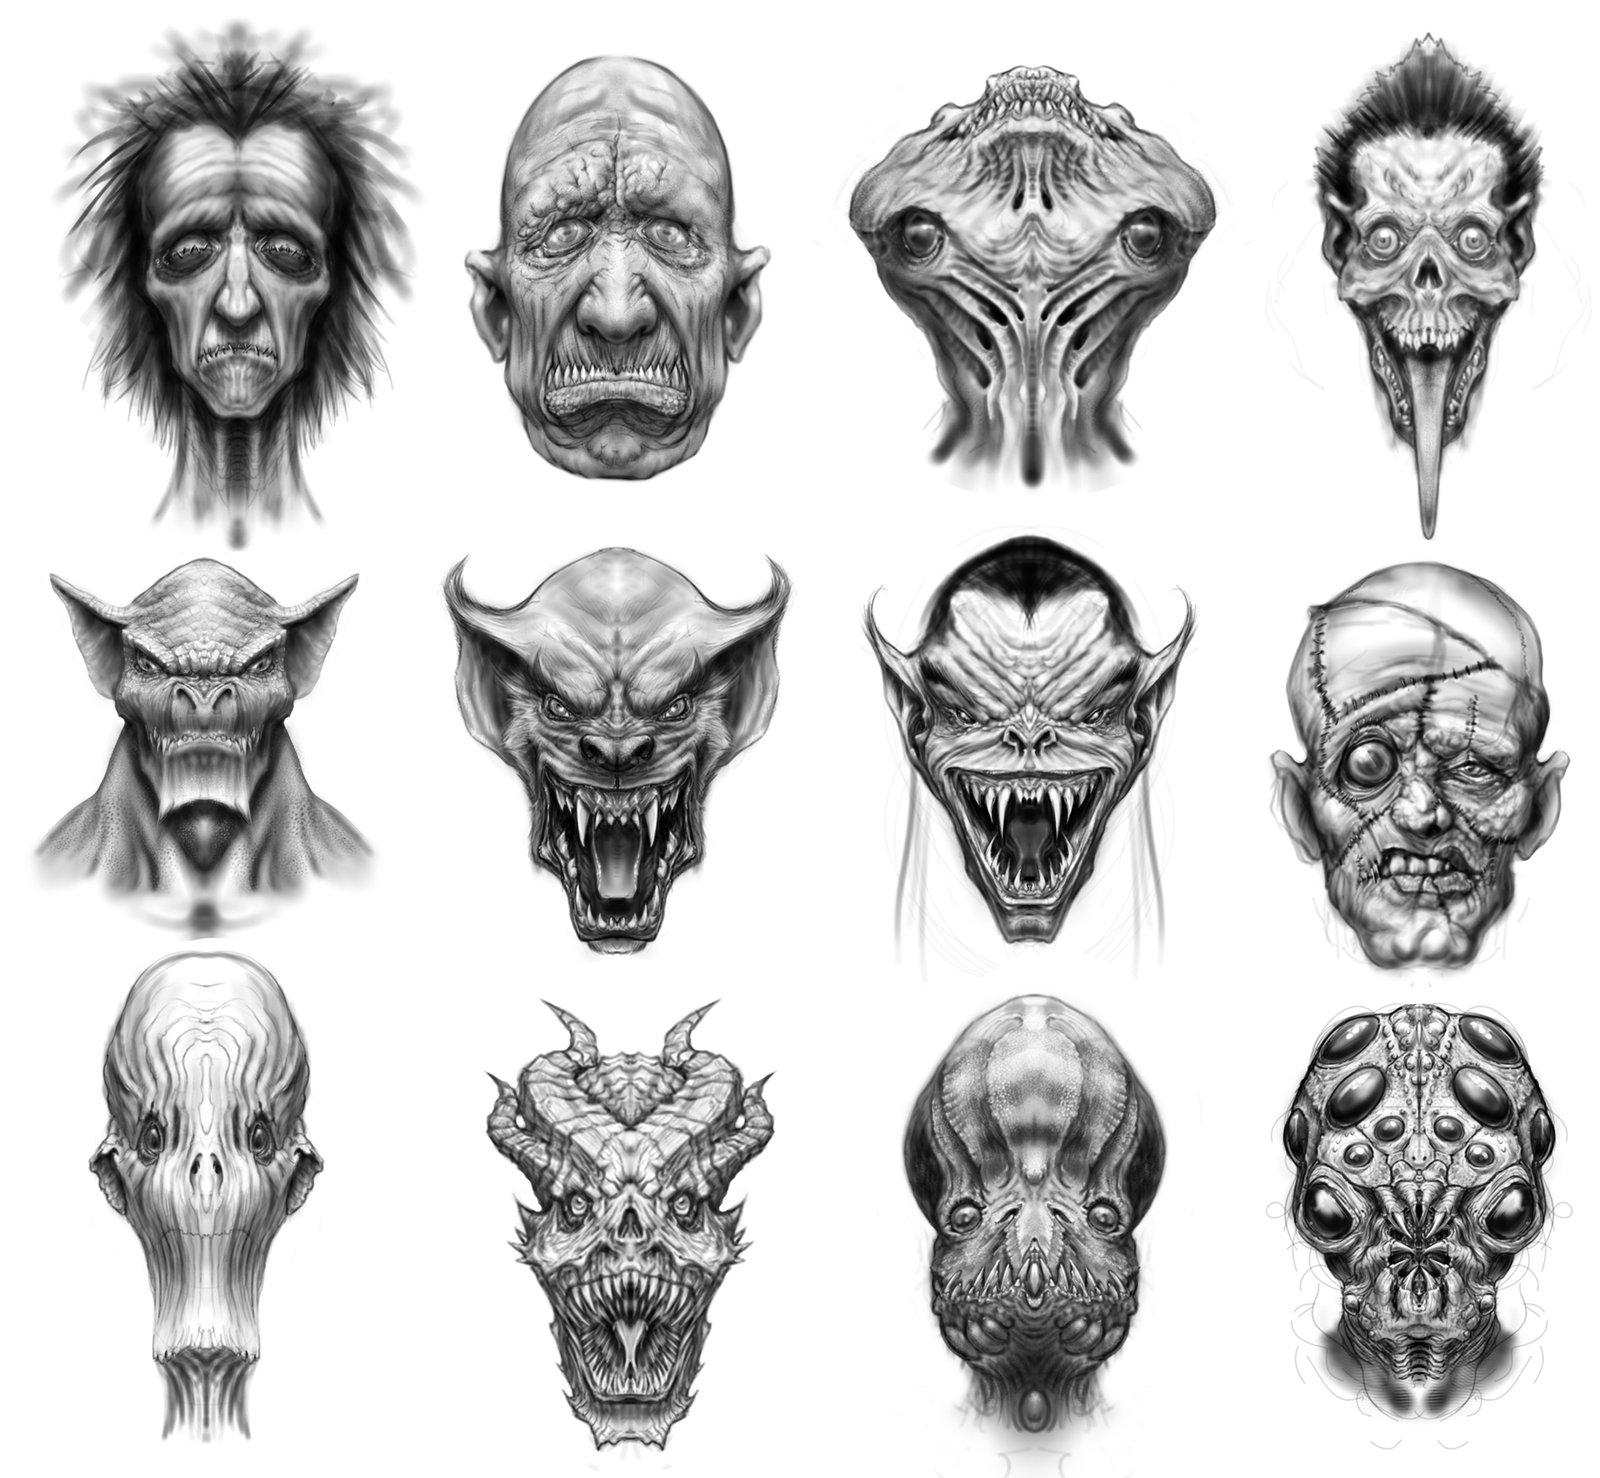 After Dark Arts: Masks